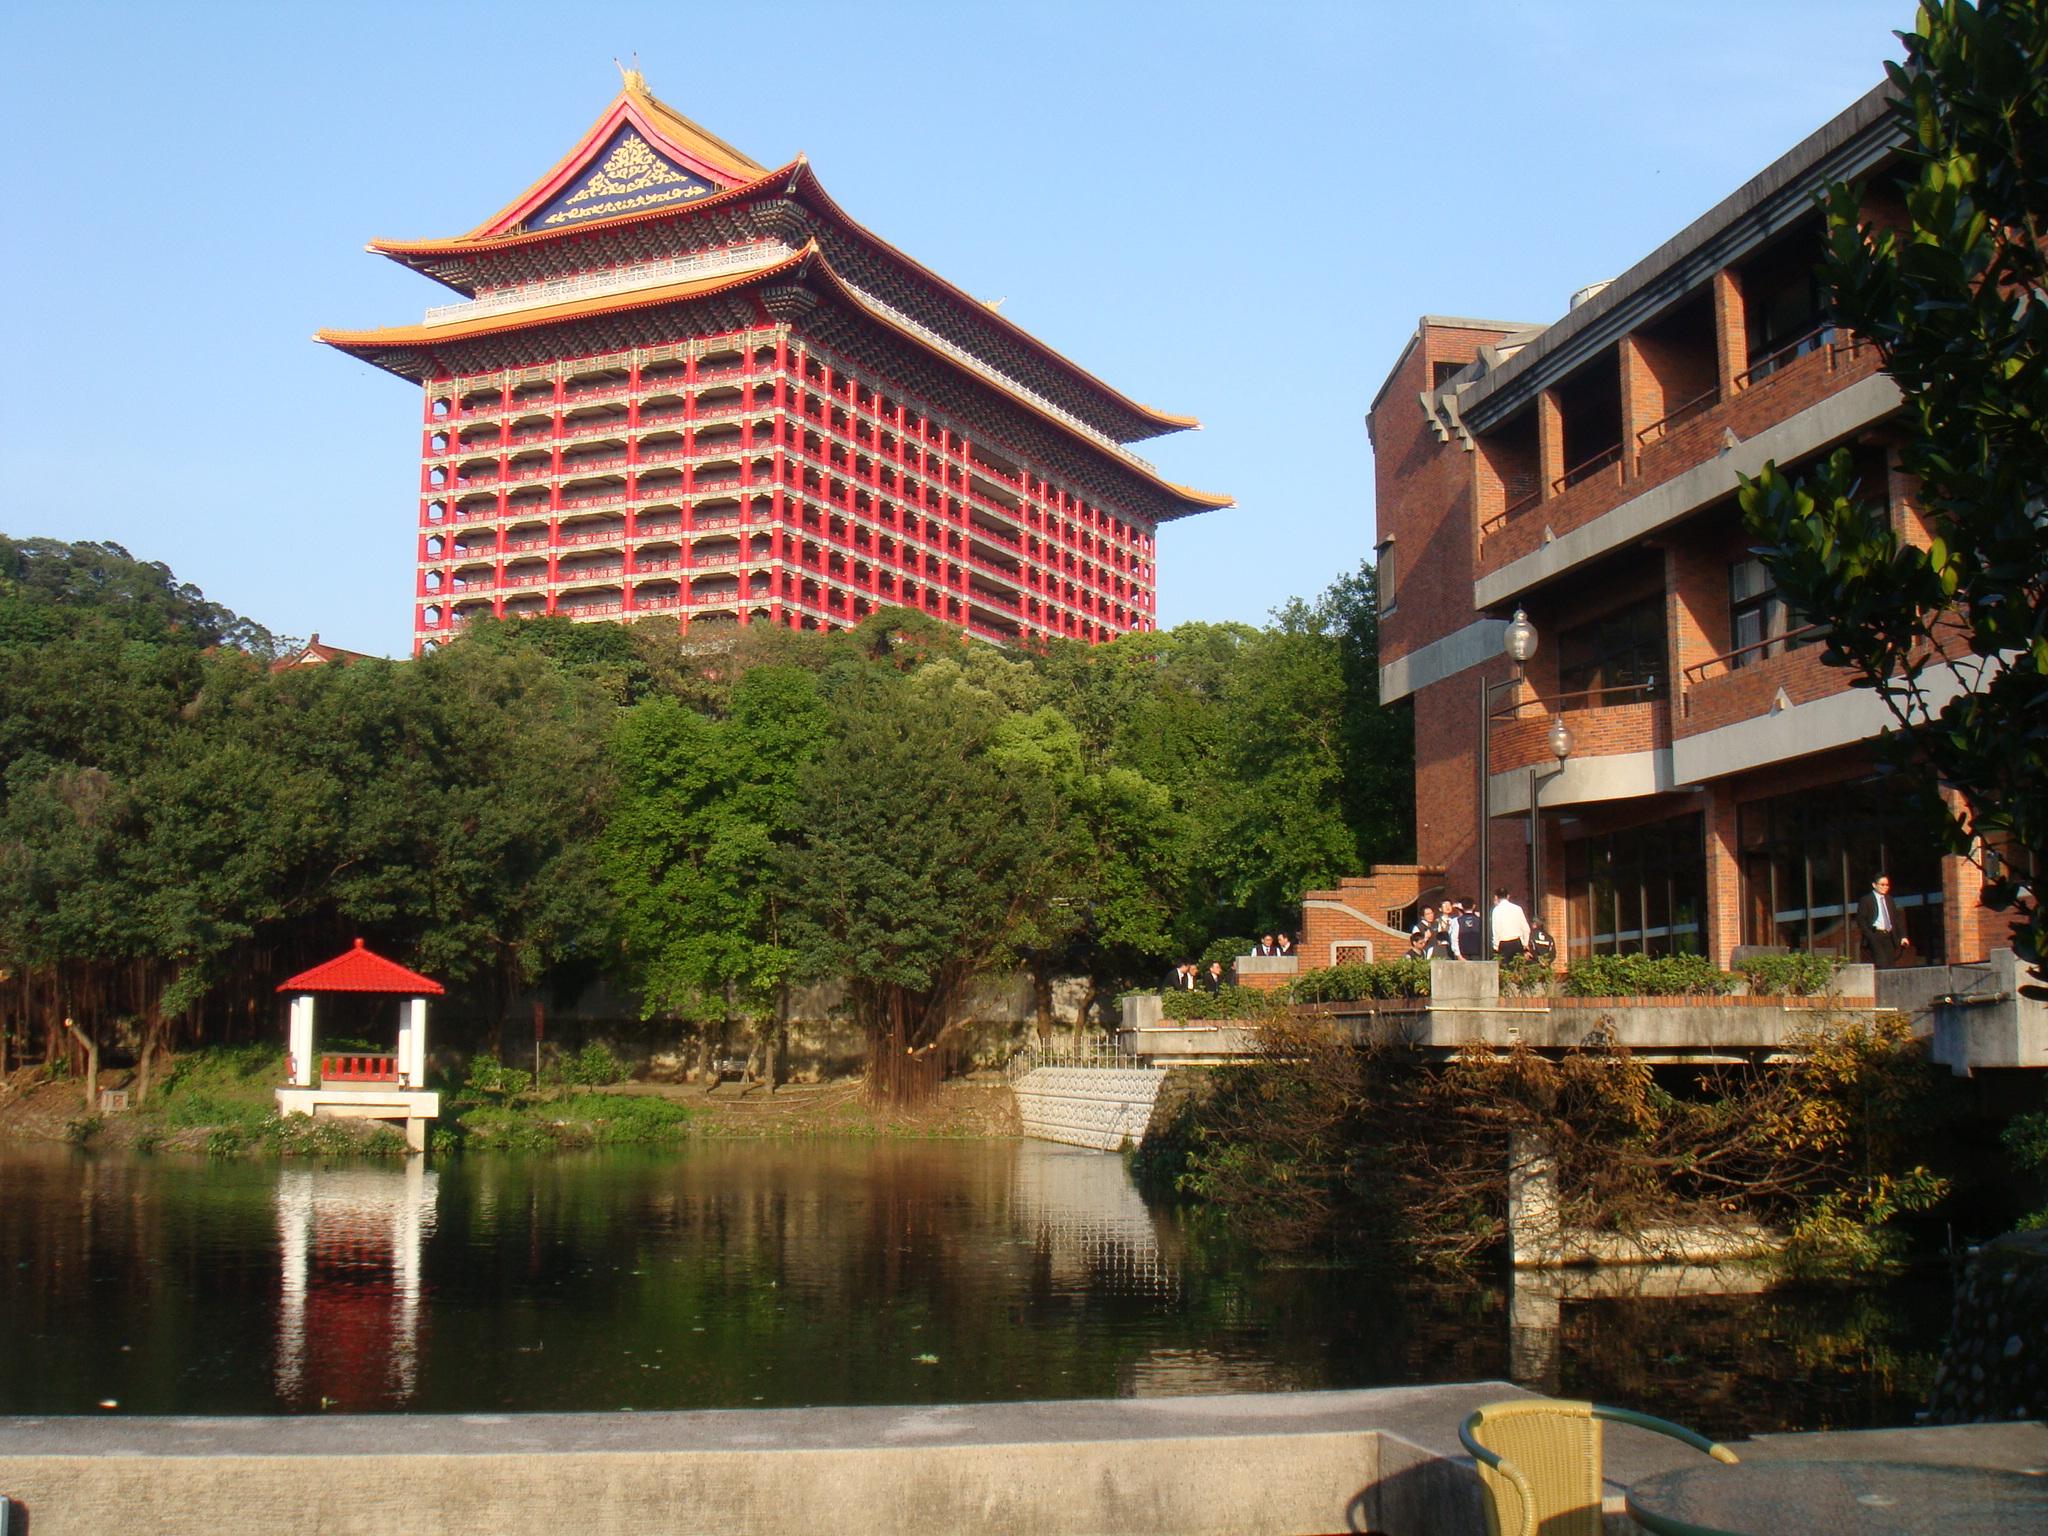 FileTaipei Grand Hotel From Jiantan